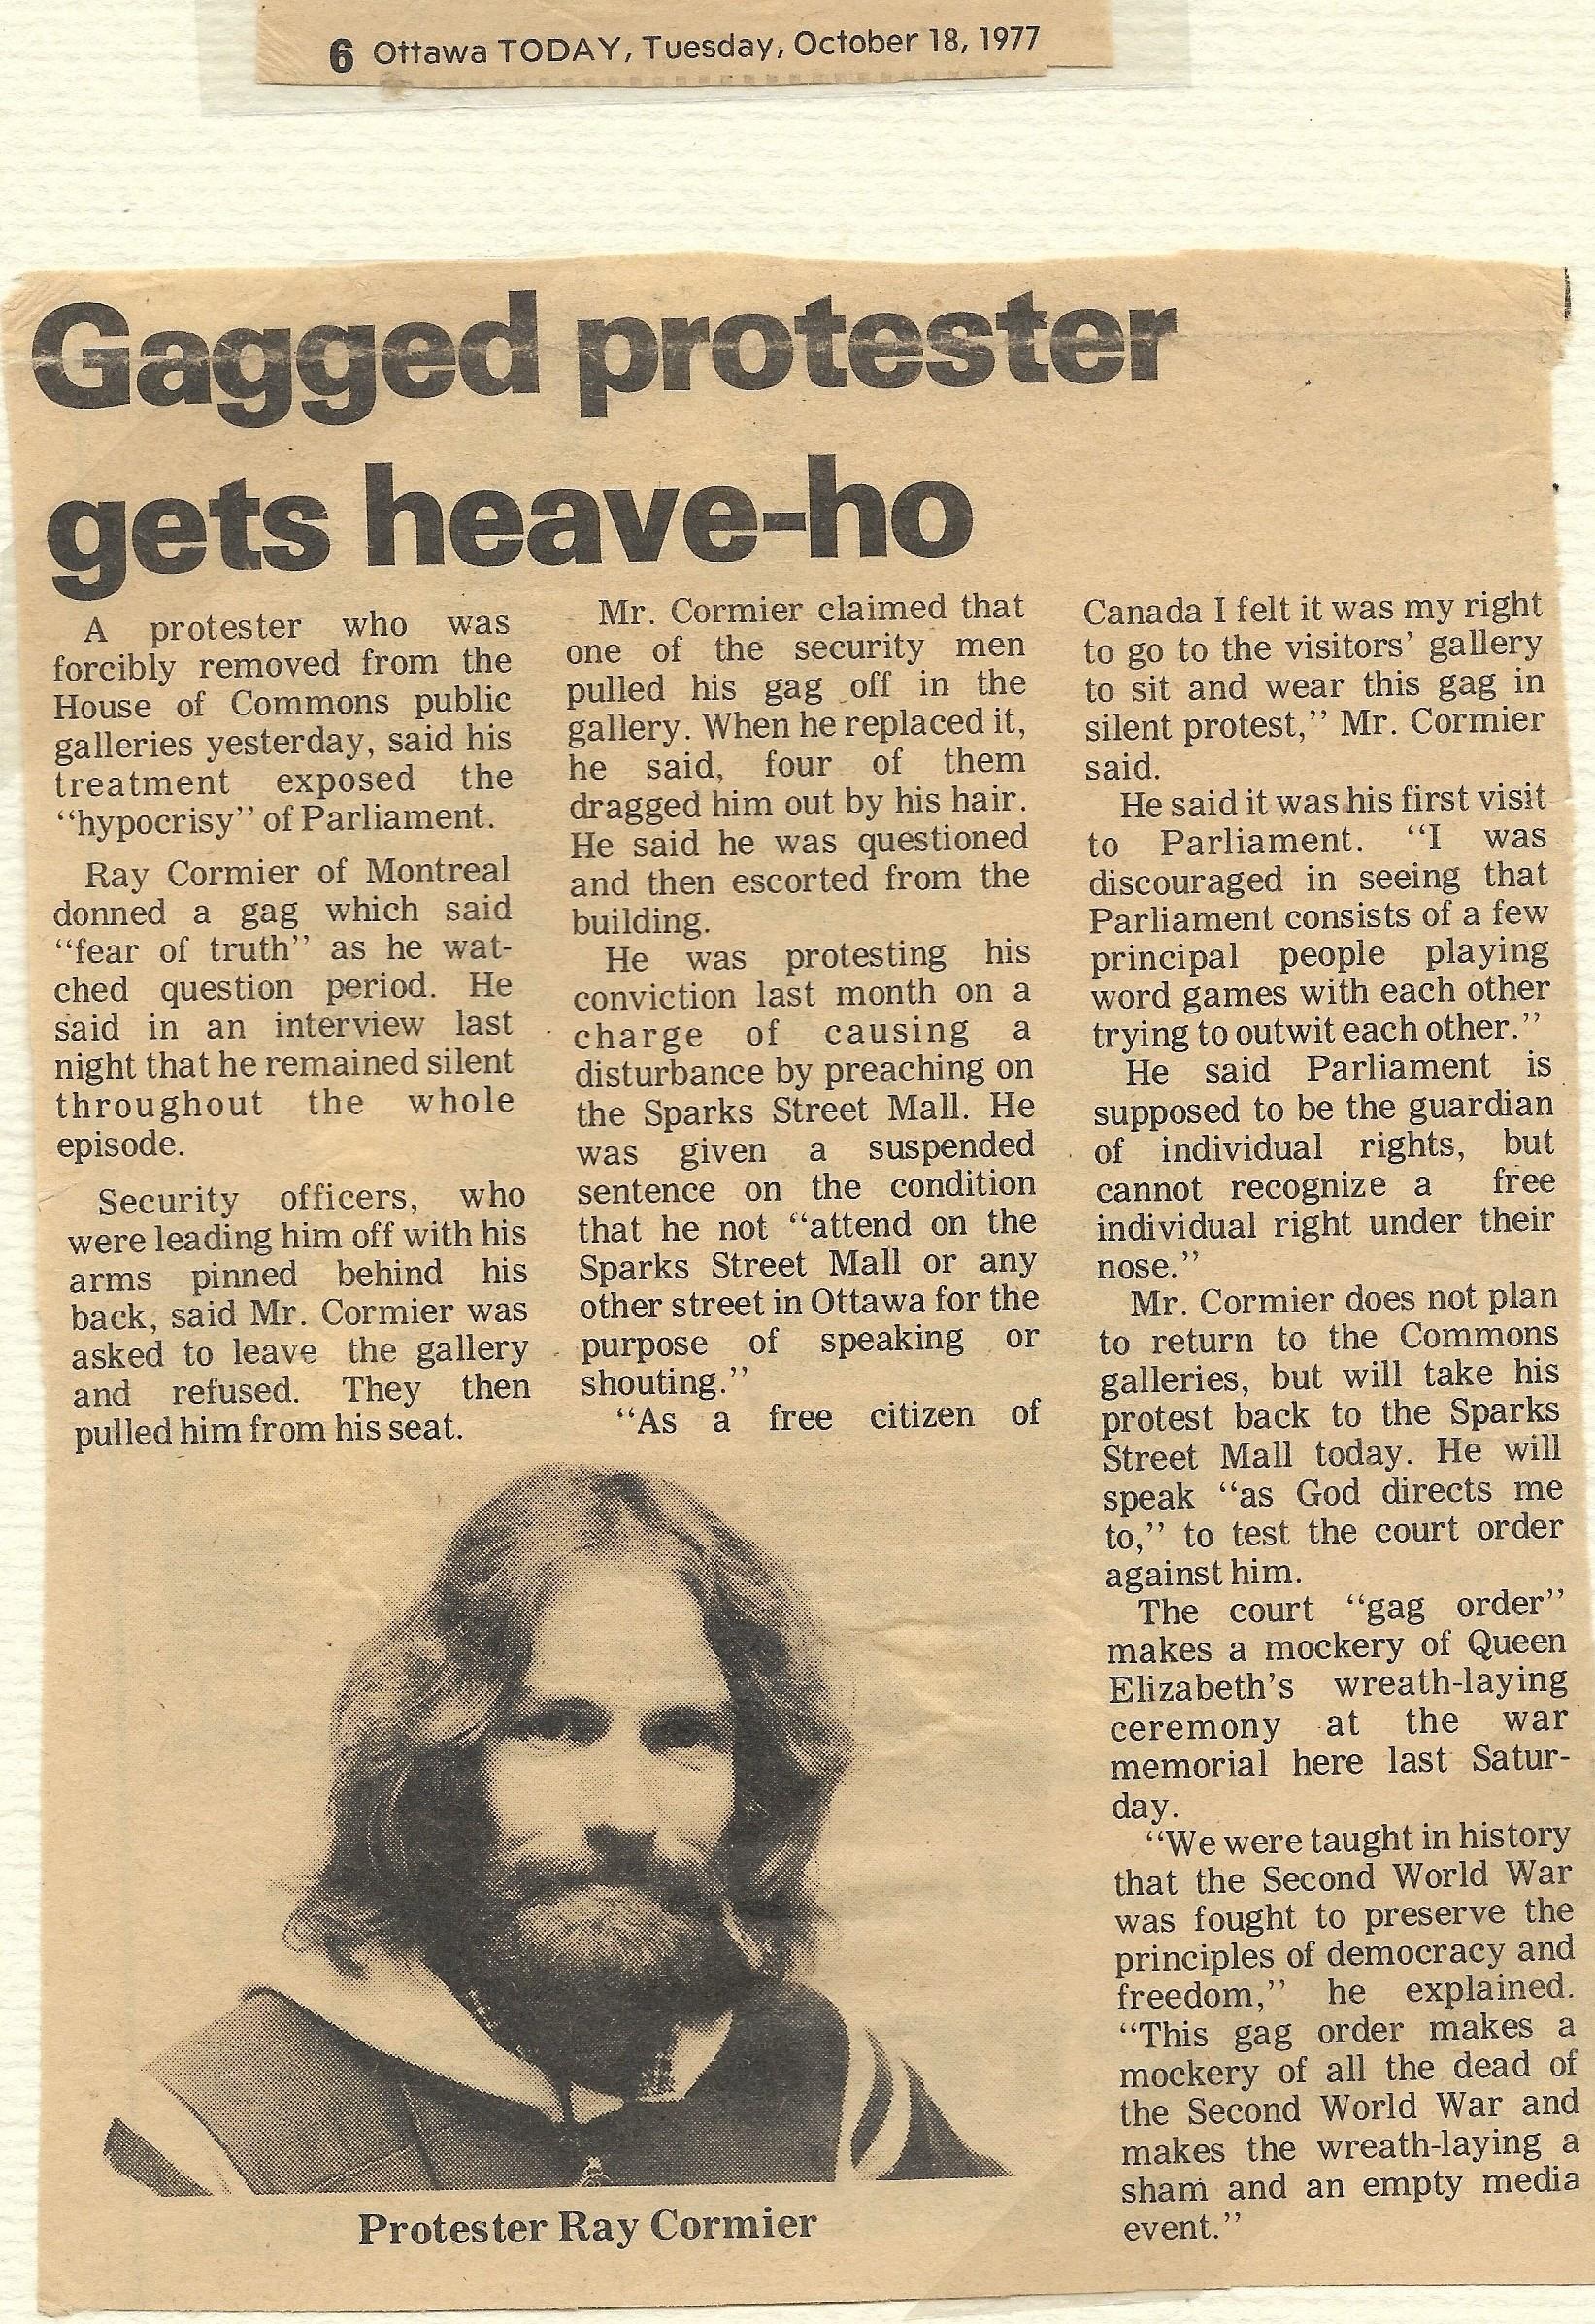 Ottawa Today, October 18, 1977